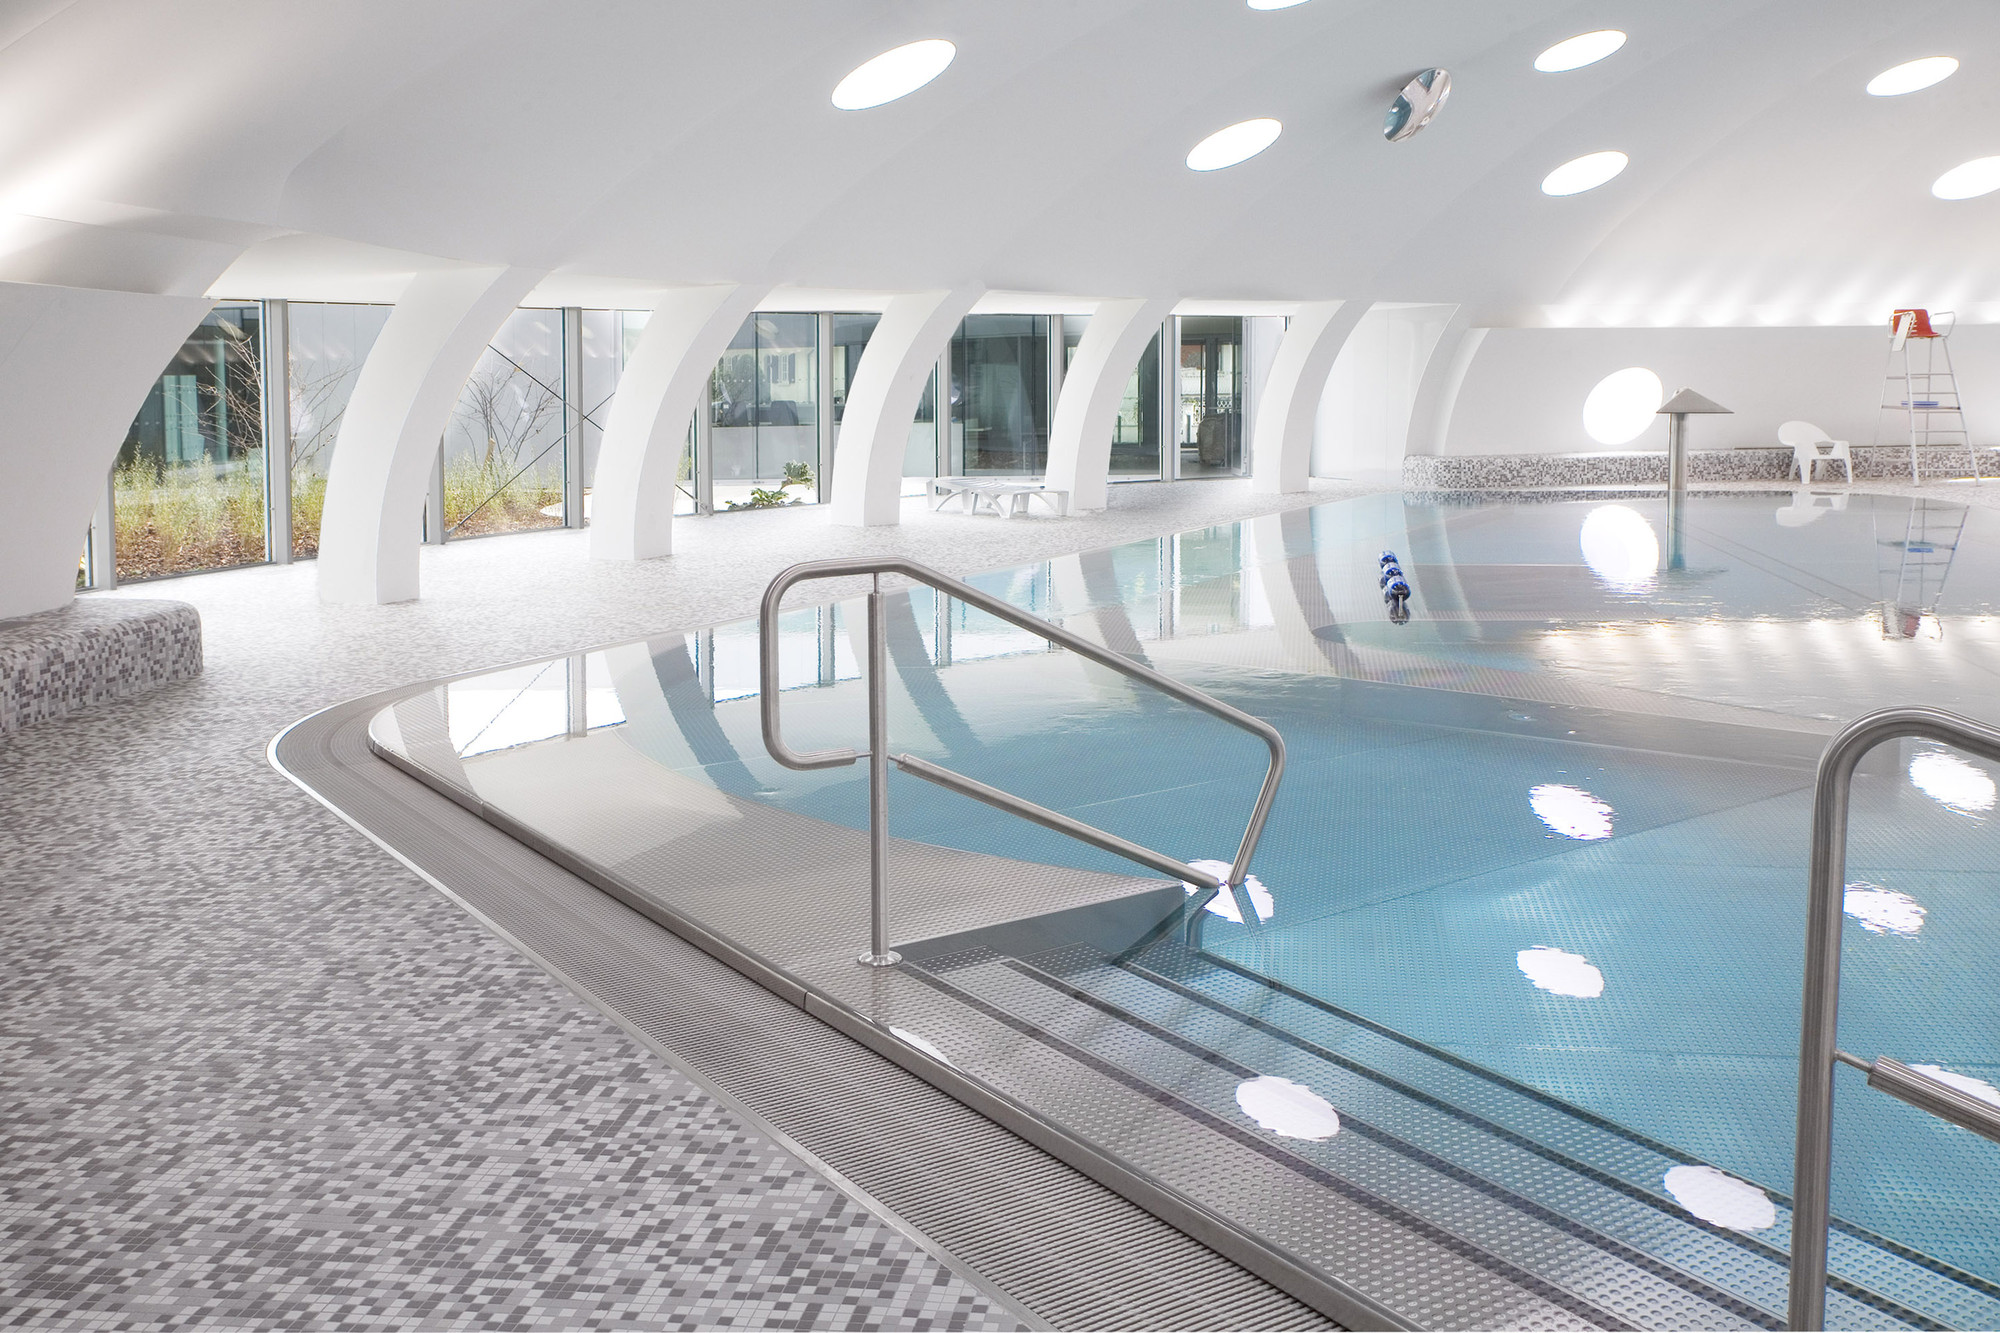 gallery of tournesol swimming pool refurbishment urbane kultur 7. Black Bedroom Furniture Sets. Home Design Ideas